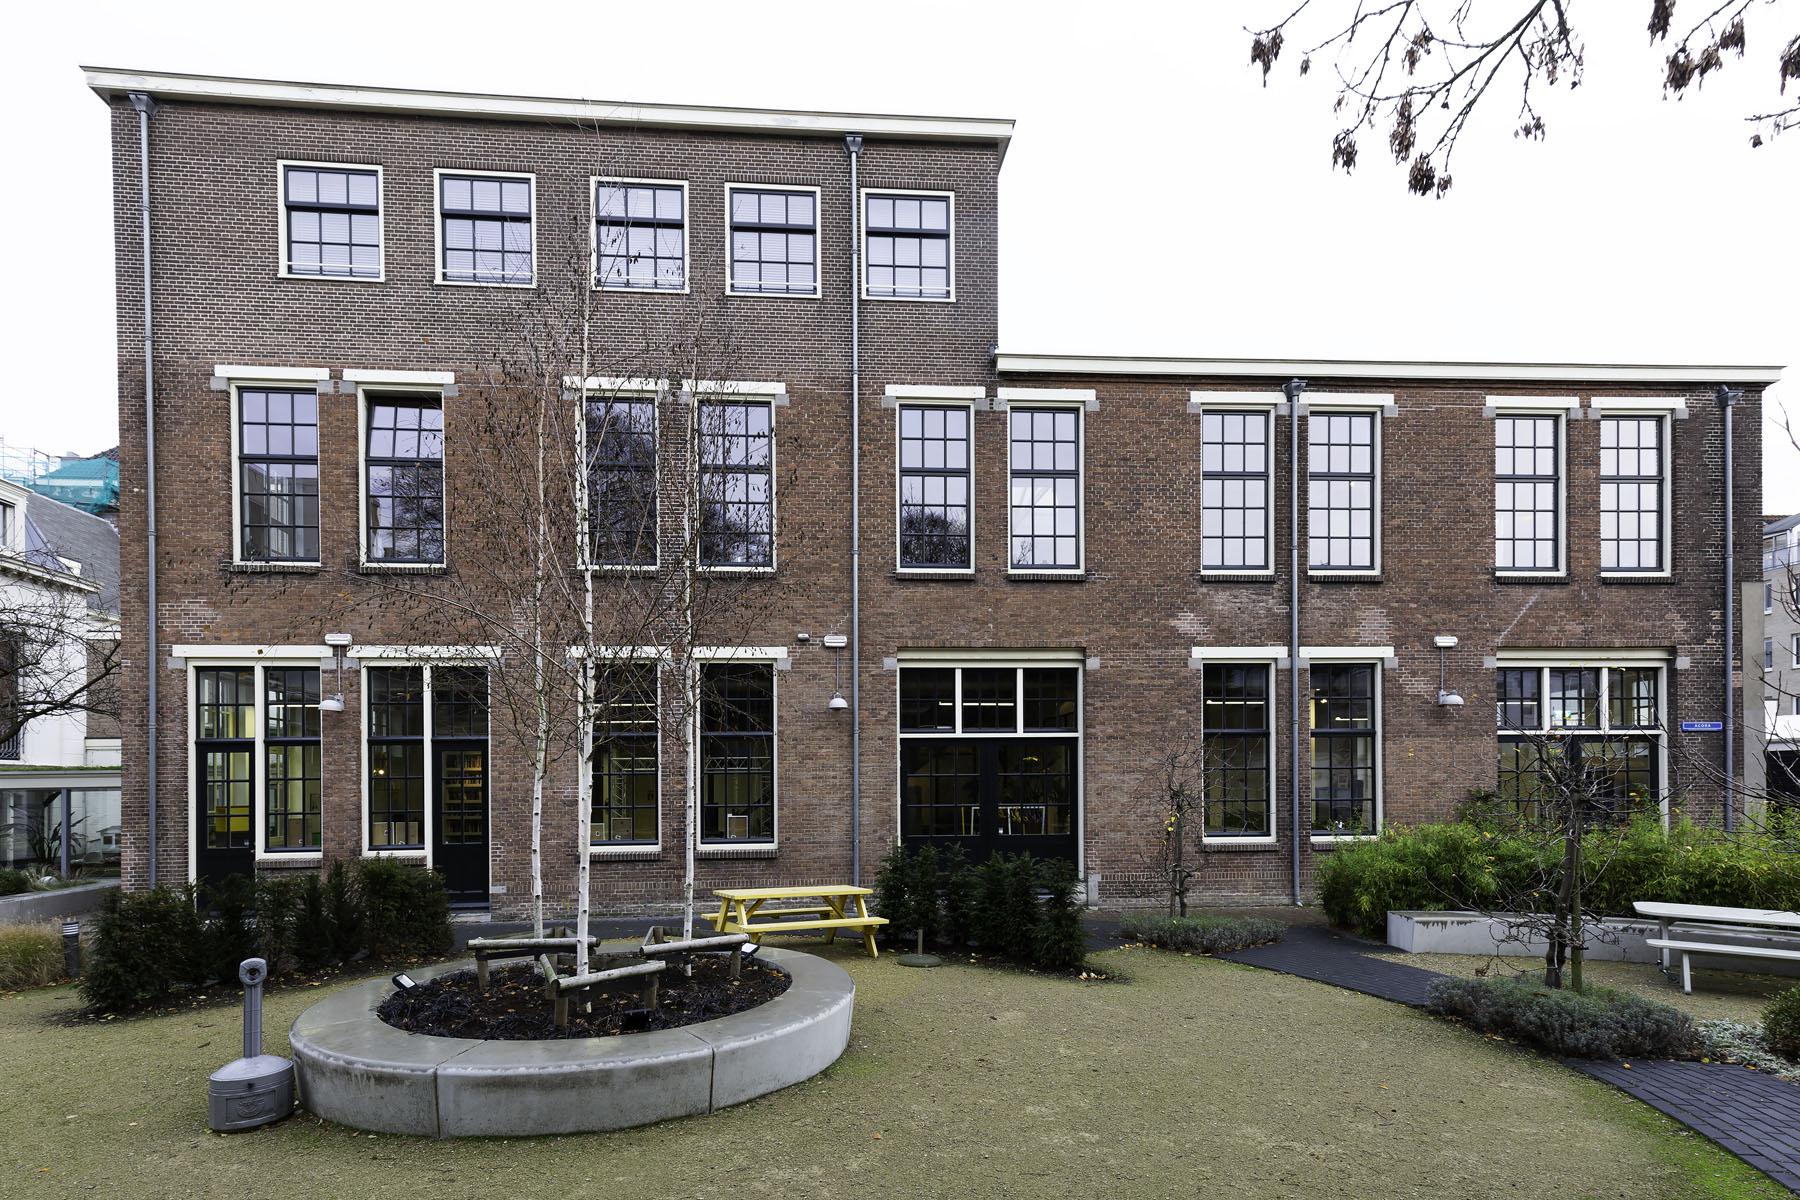 Freedom-Lab-Amsterdam-Jeroen-Machielsen-25.jpg